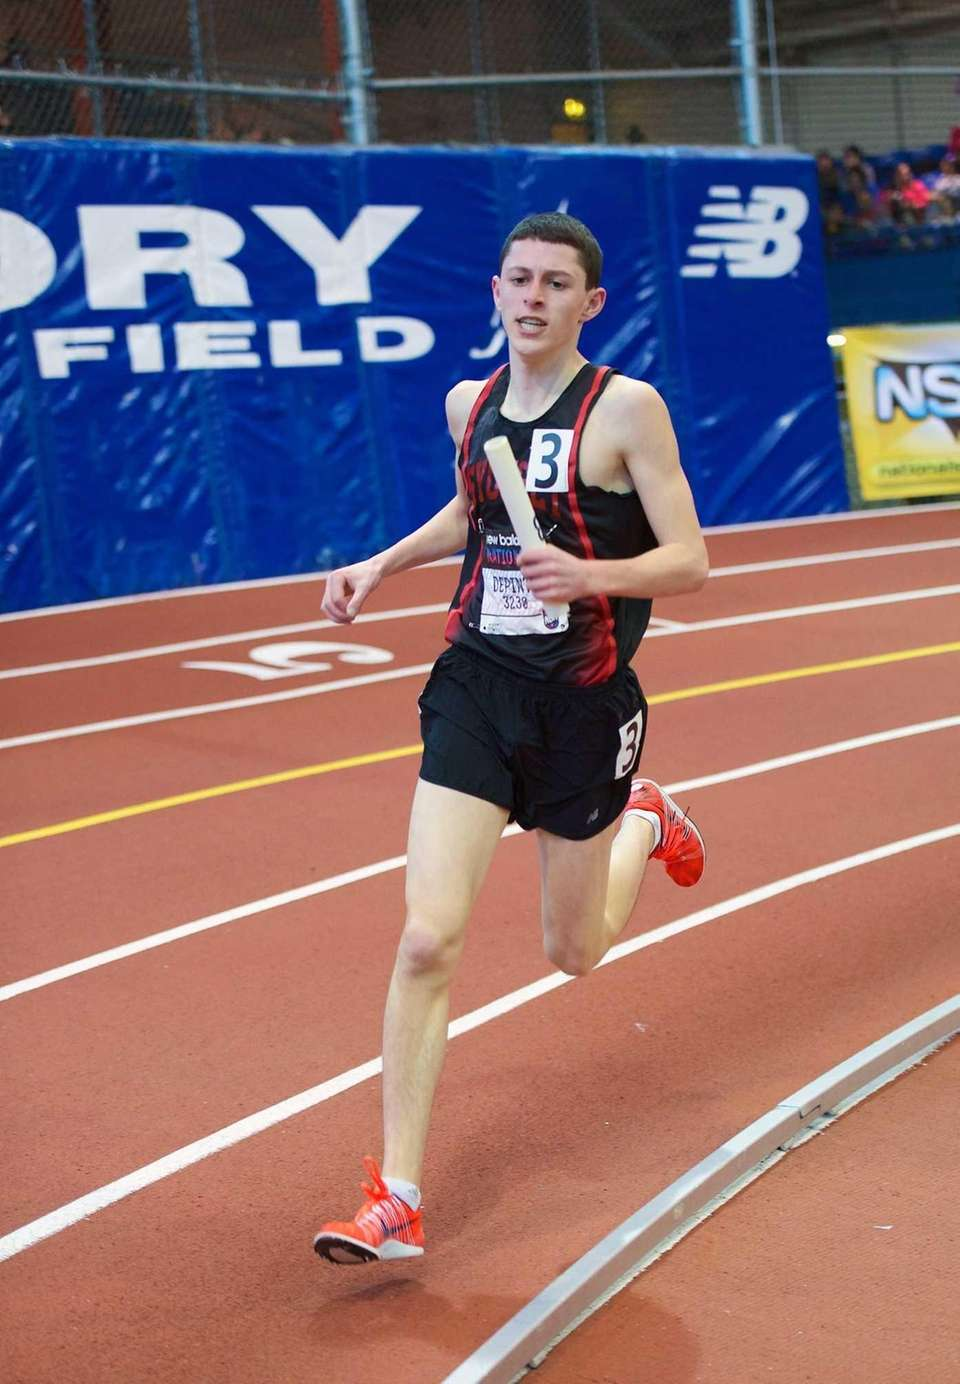 Ryan Depinto runs as part of the Syosset